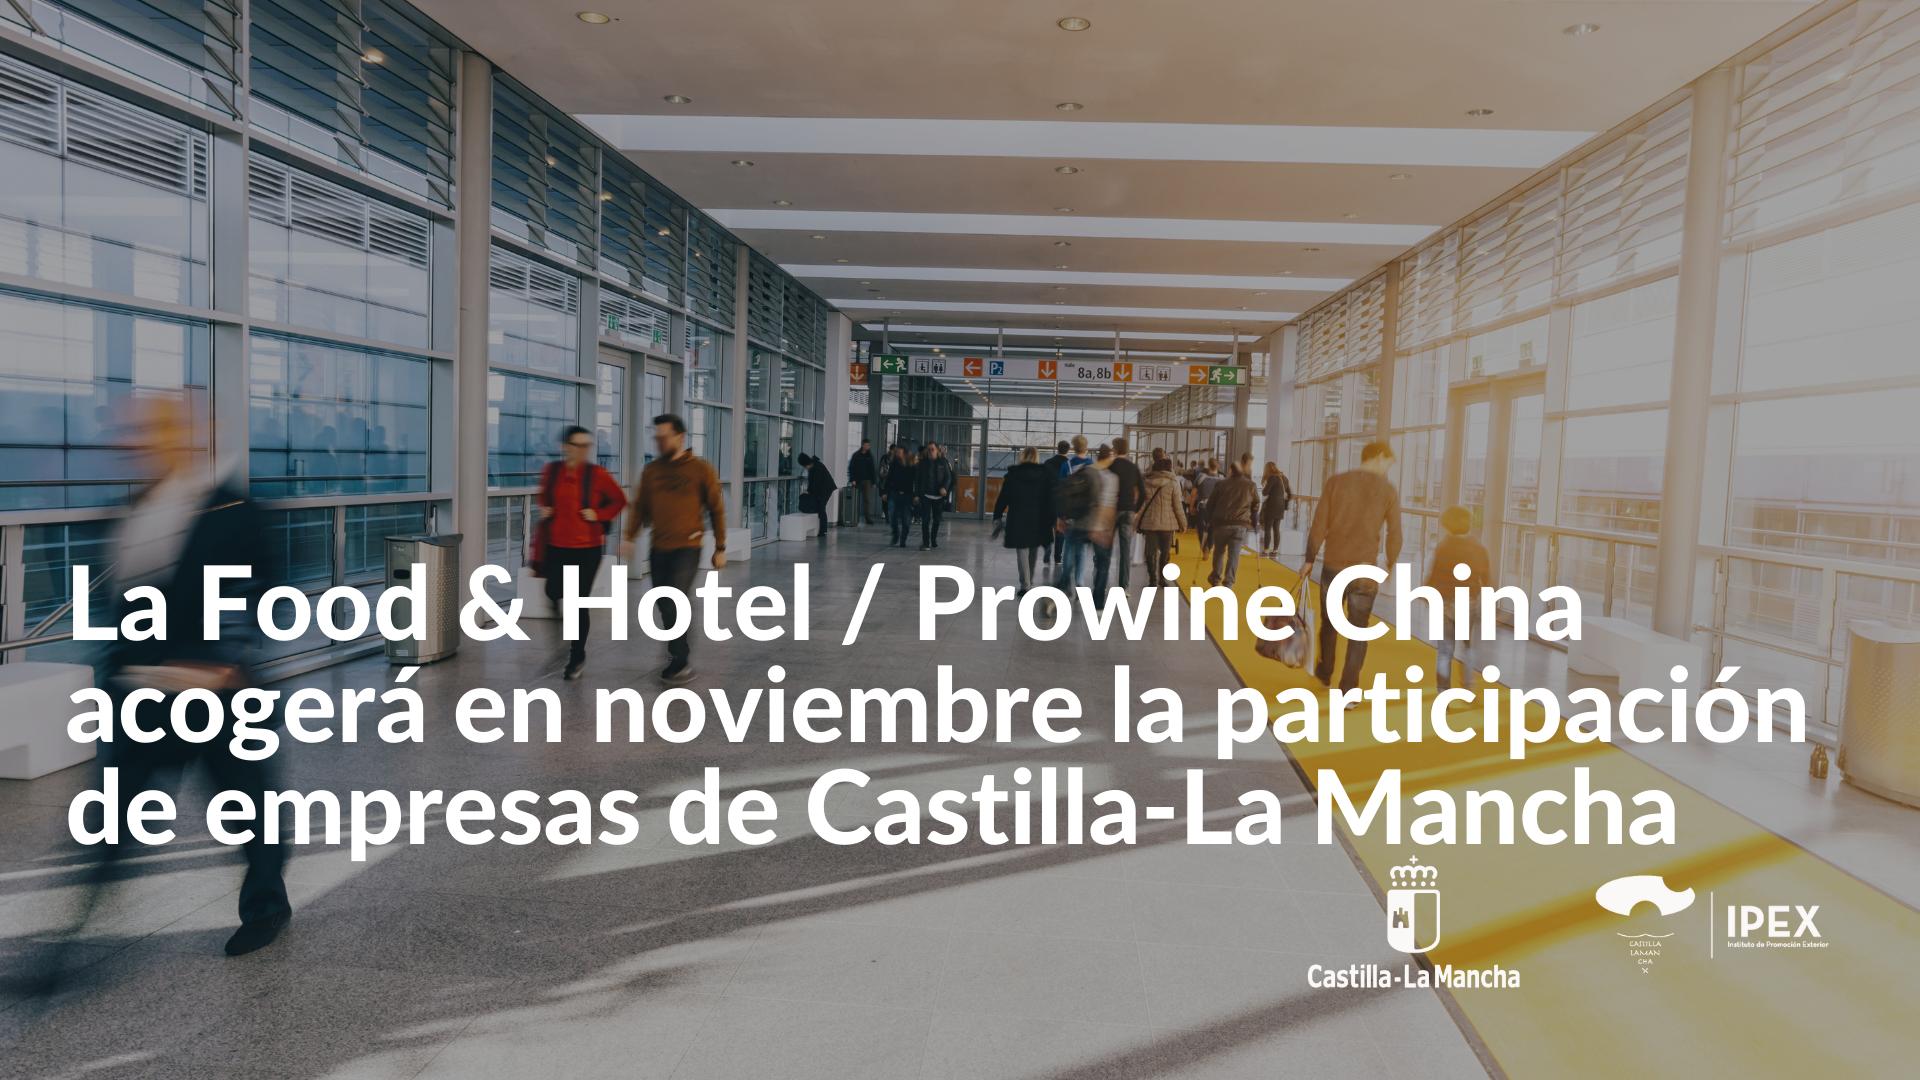 food & hotel prowine chine